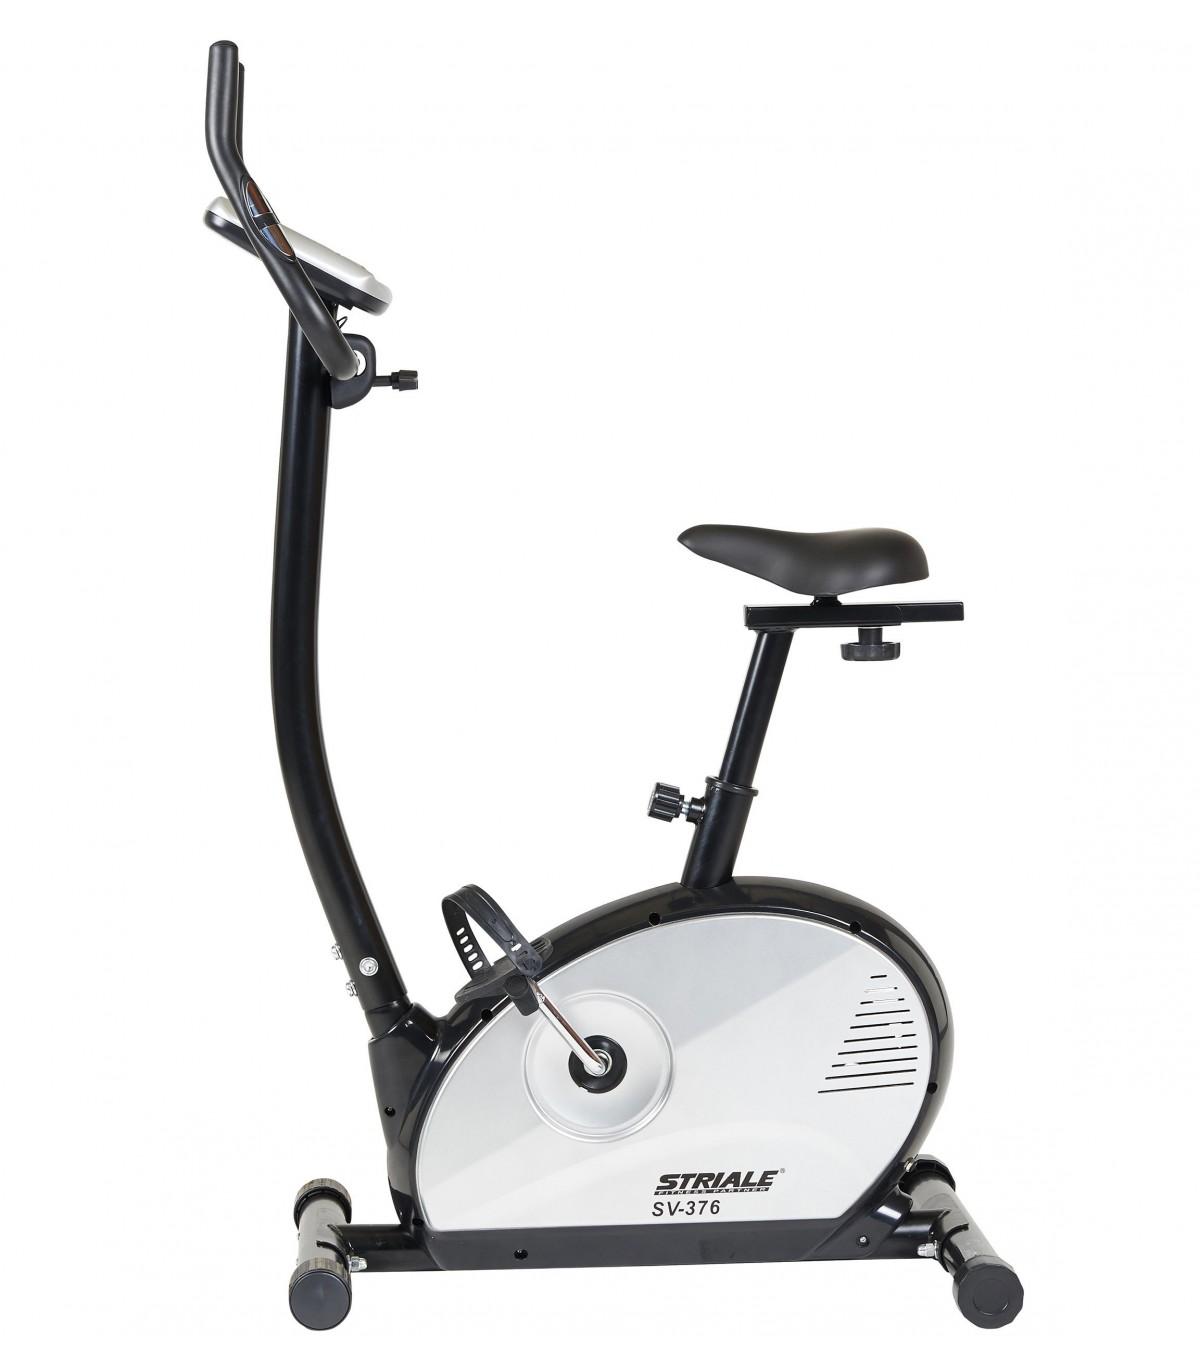 Vélo Dappartement Sv 376 Care Fitness